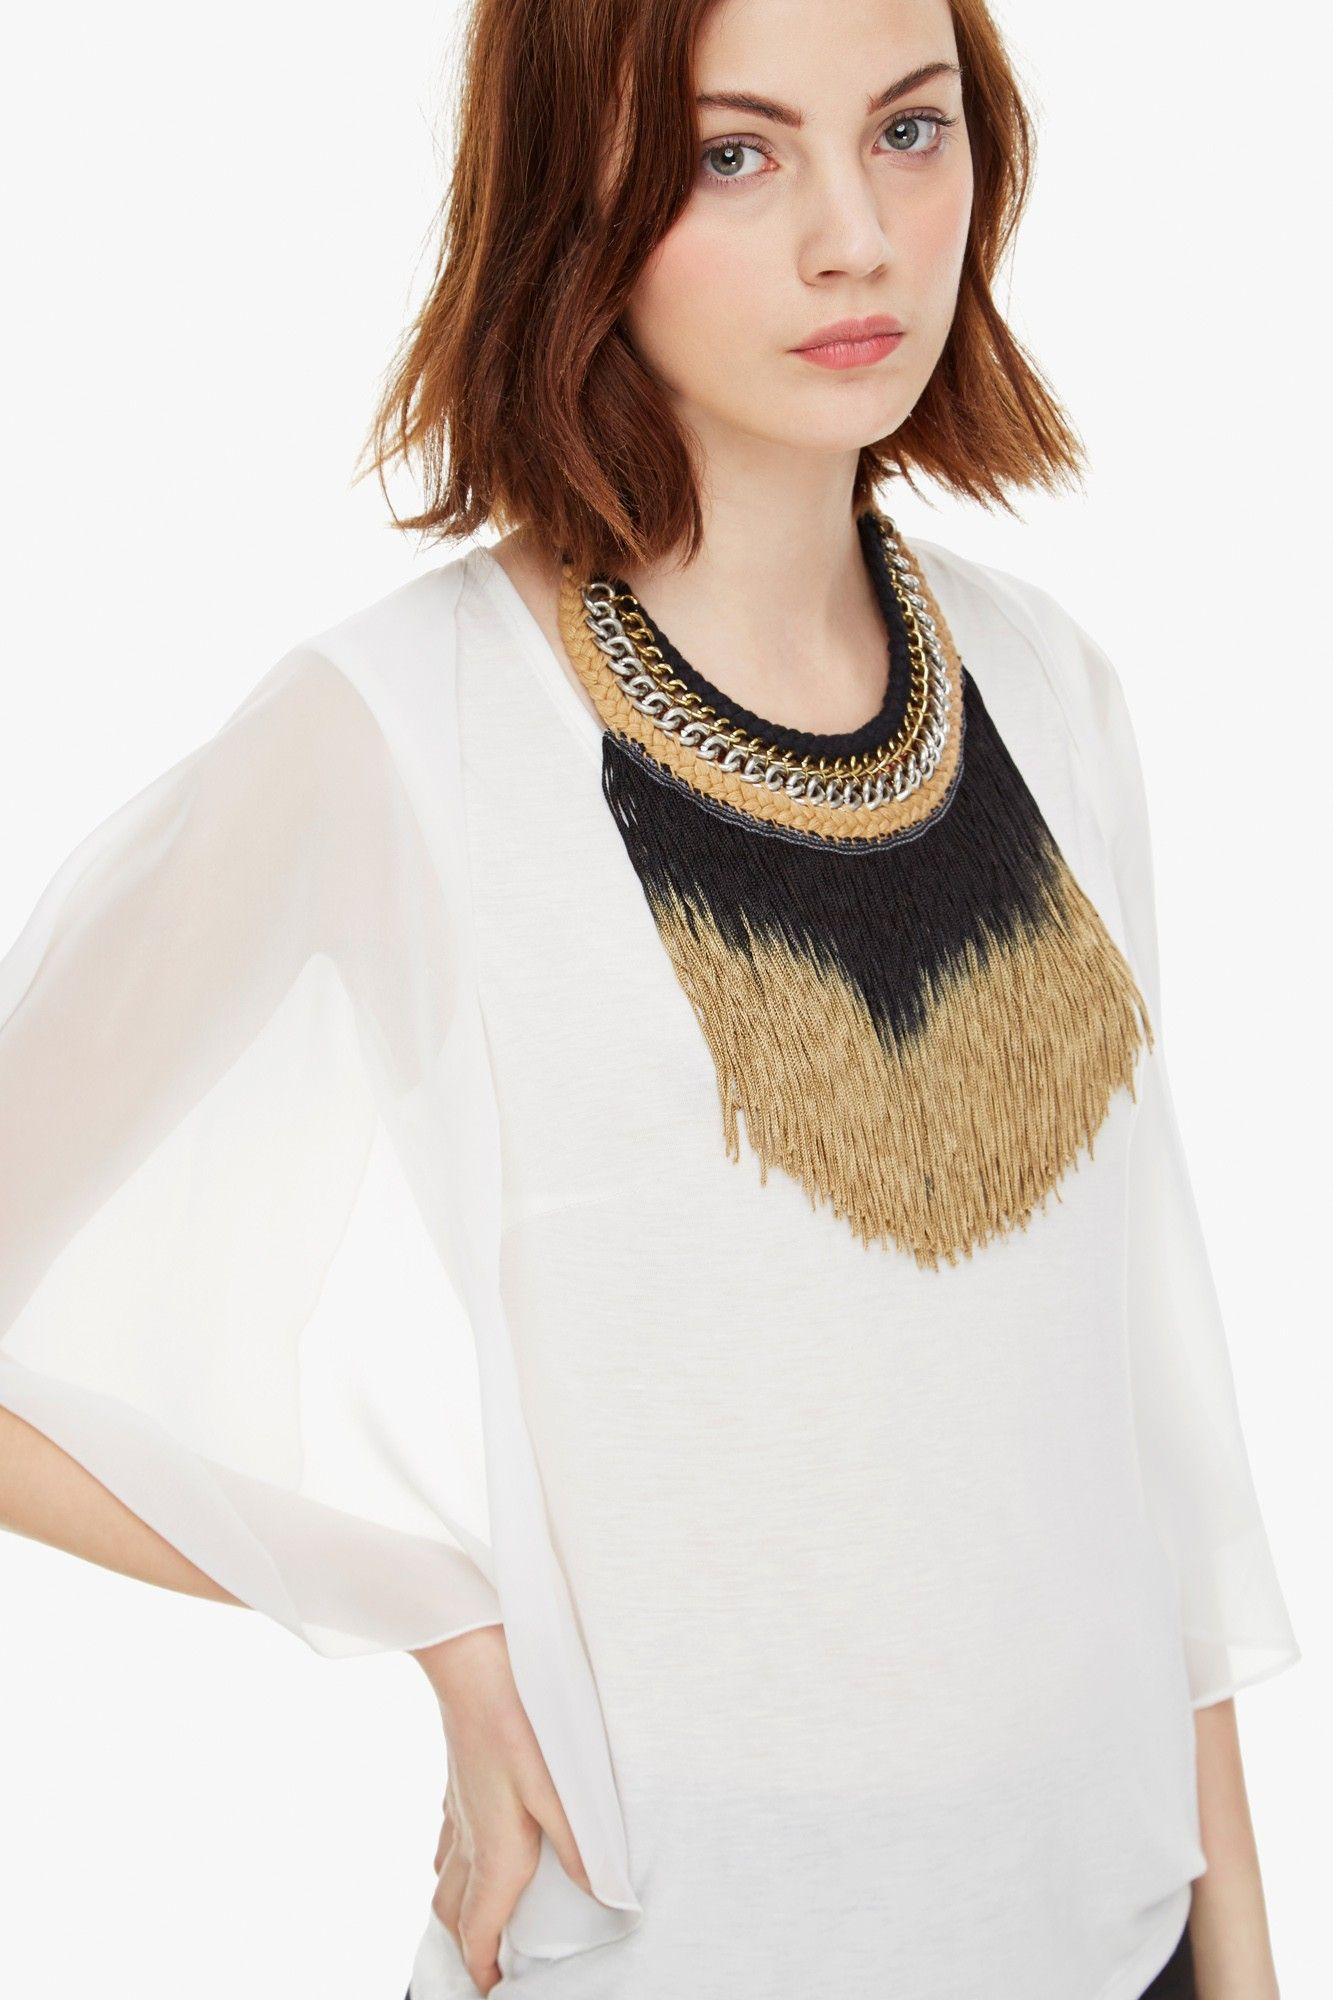 Camiseta b sica con volantes de gasa camisetas adolfo for Vestidos largos adolfo dominguez outlet